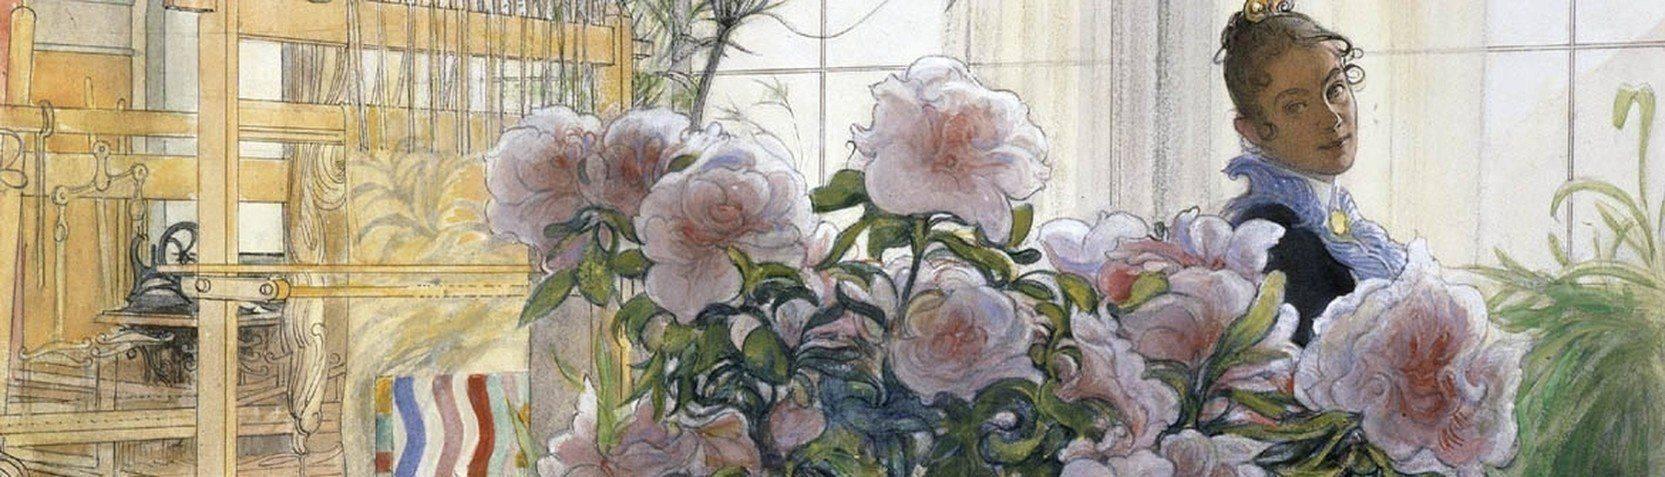 Artistes - Carl Larsson